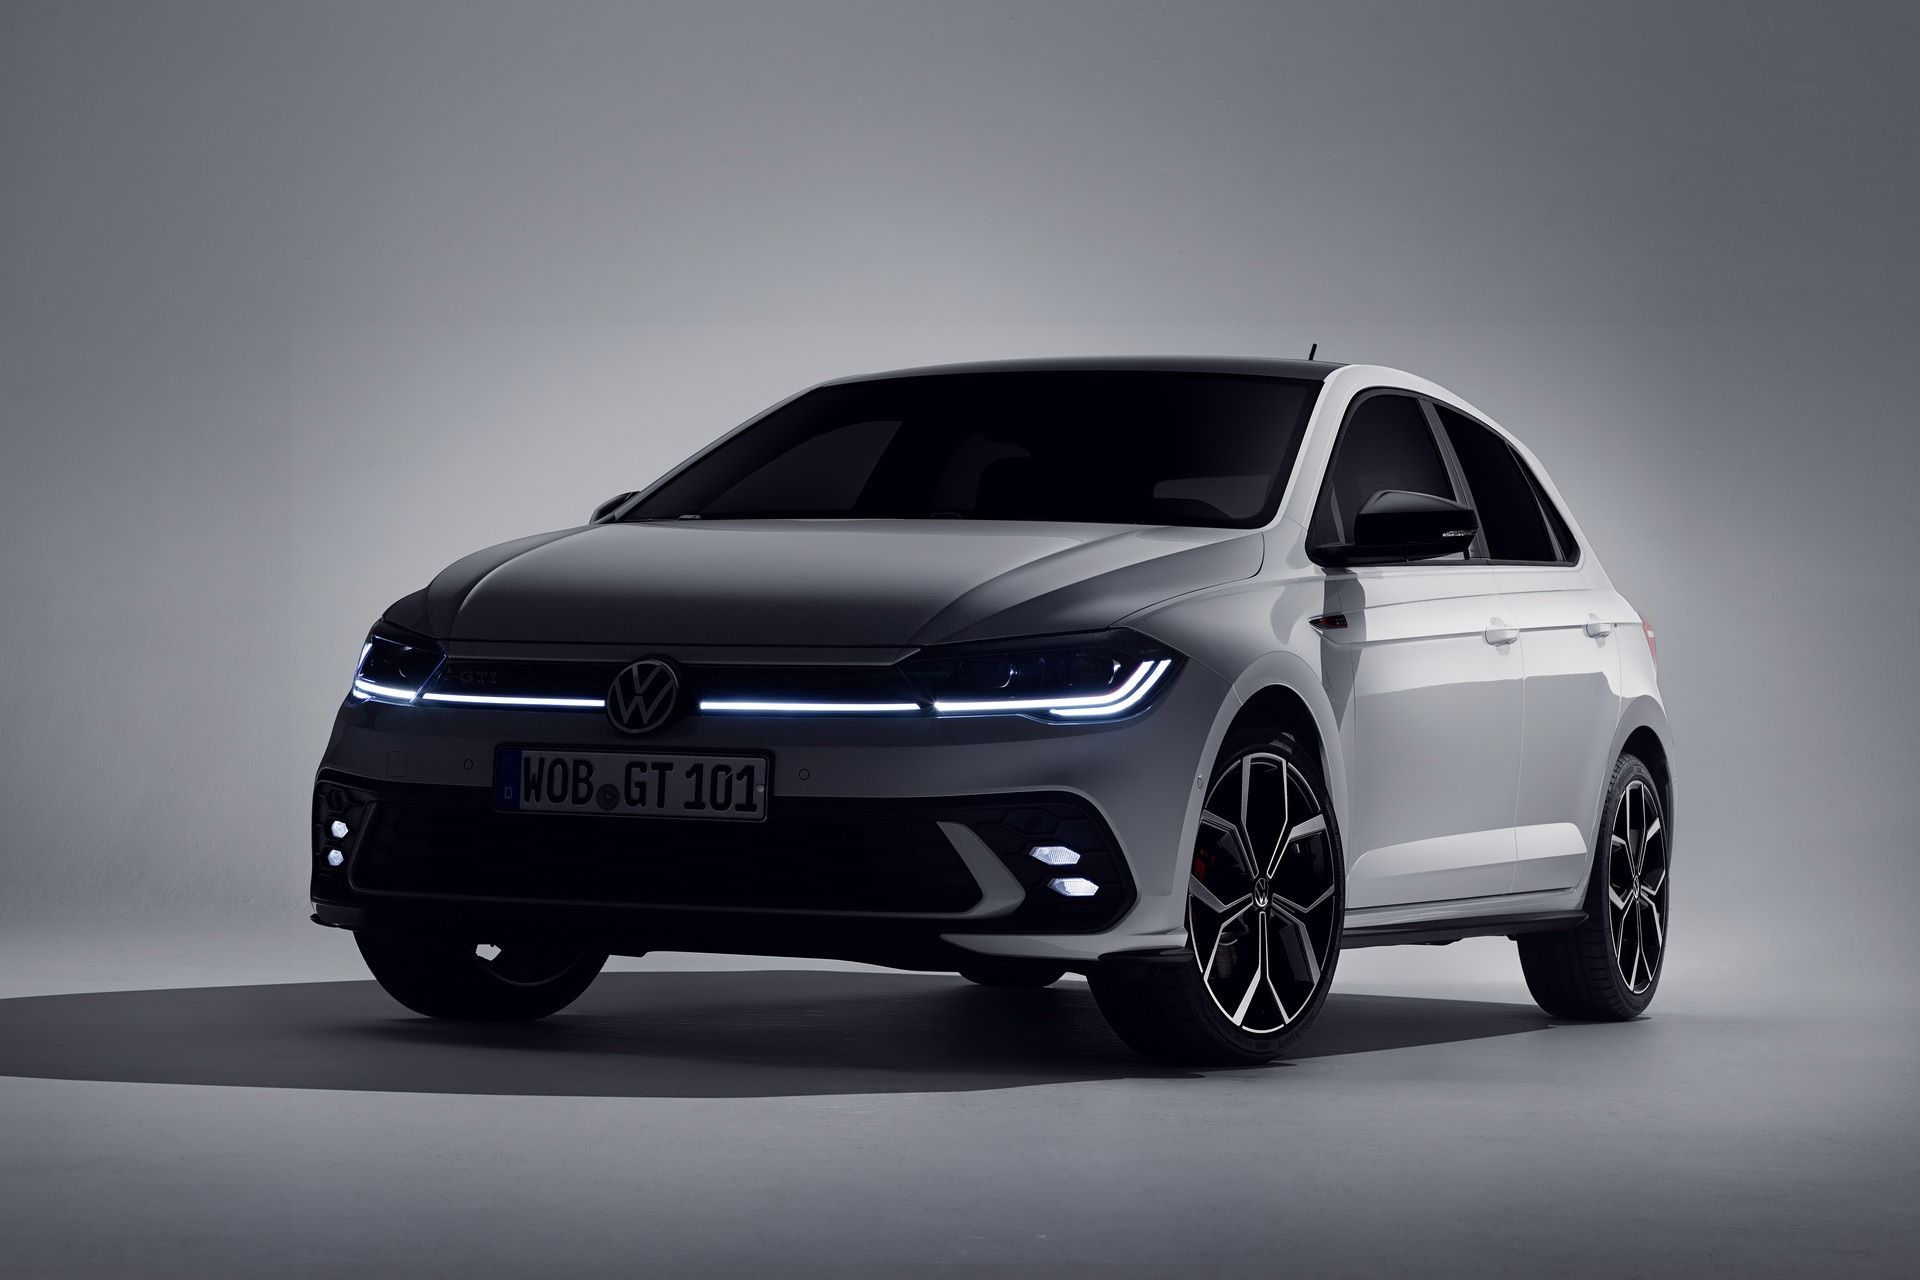 VW-Polo-GTI-facelift-5